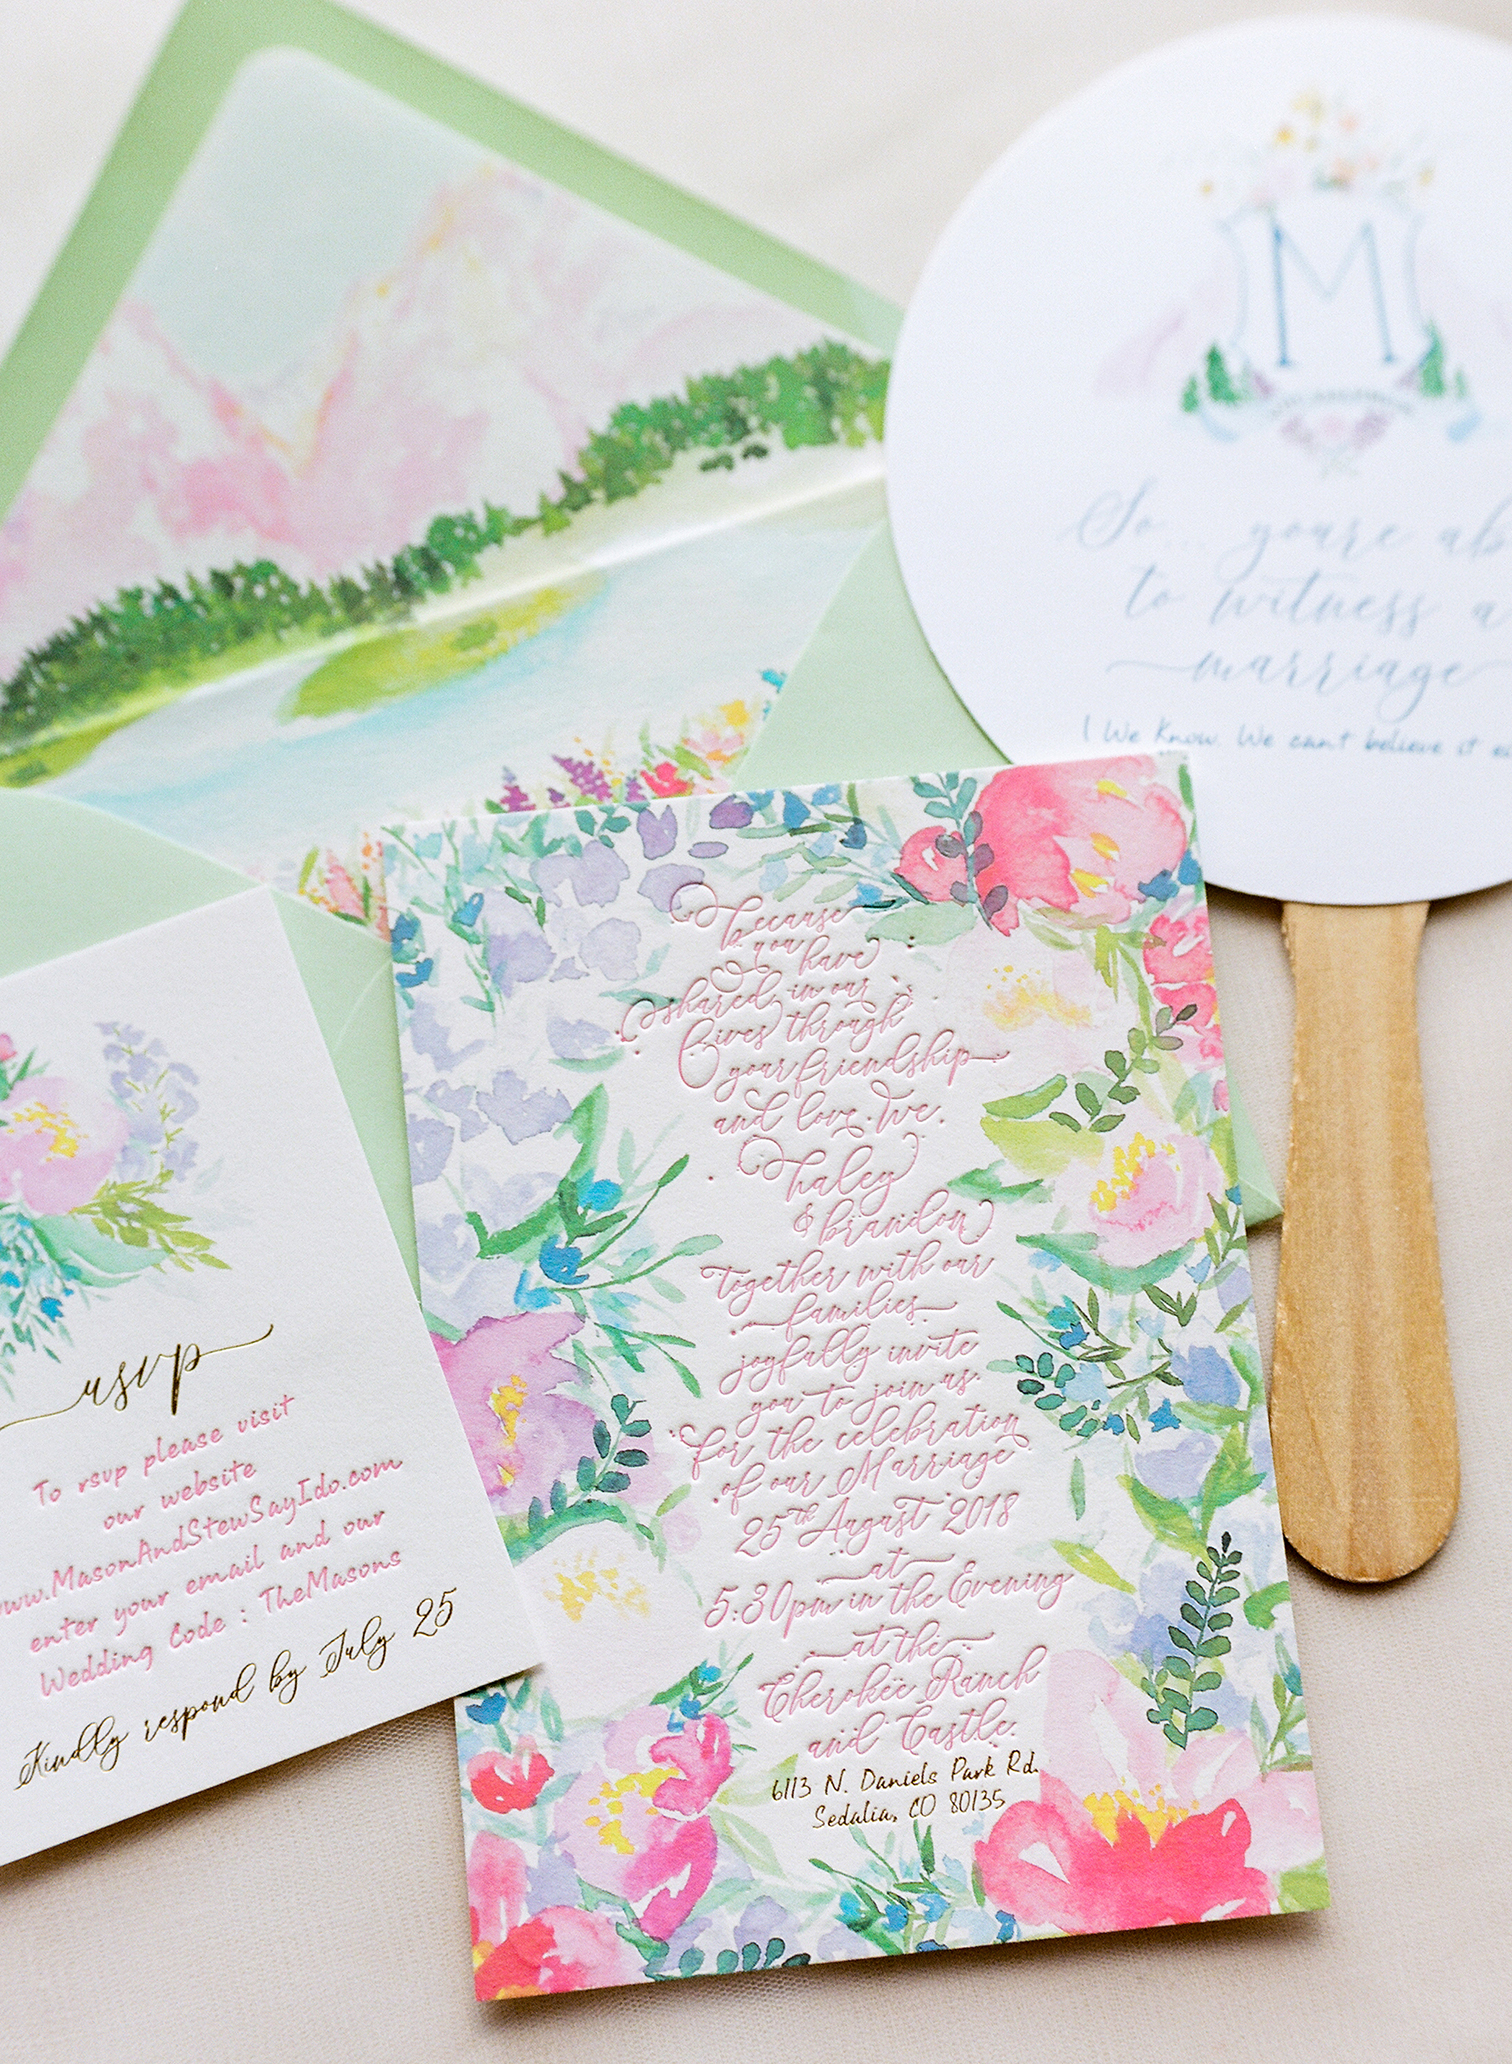 Wedding Photographers Colorado, Custom Wedding Invitations, Letterpress, Destination Weddings, Calligraphy Featured in Brides